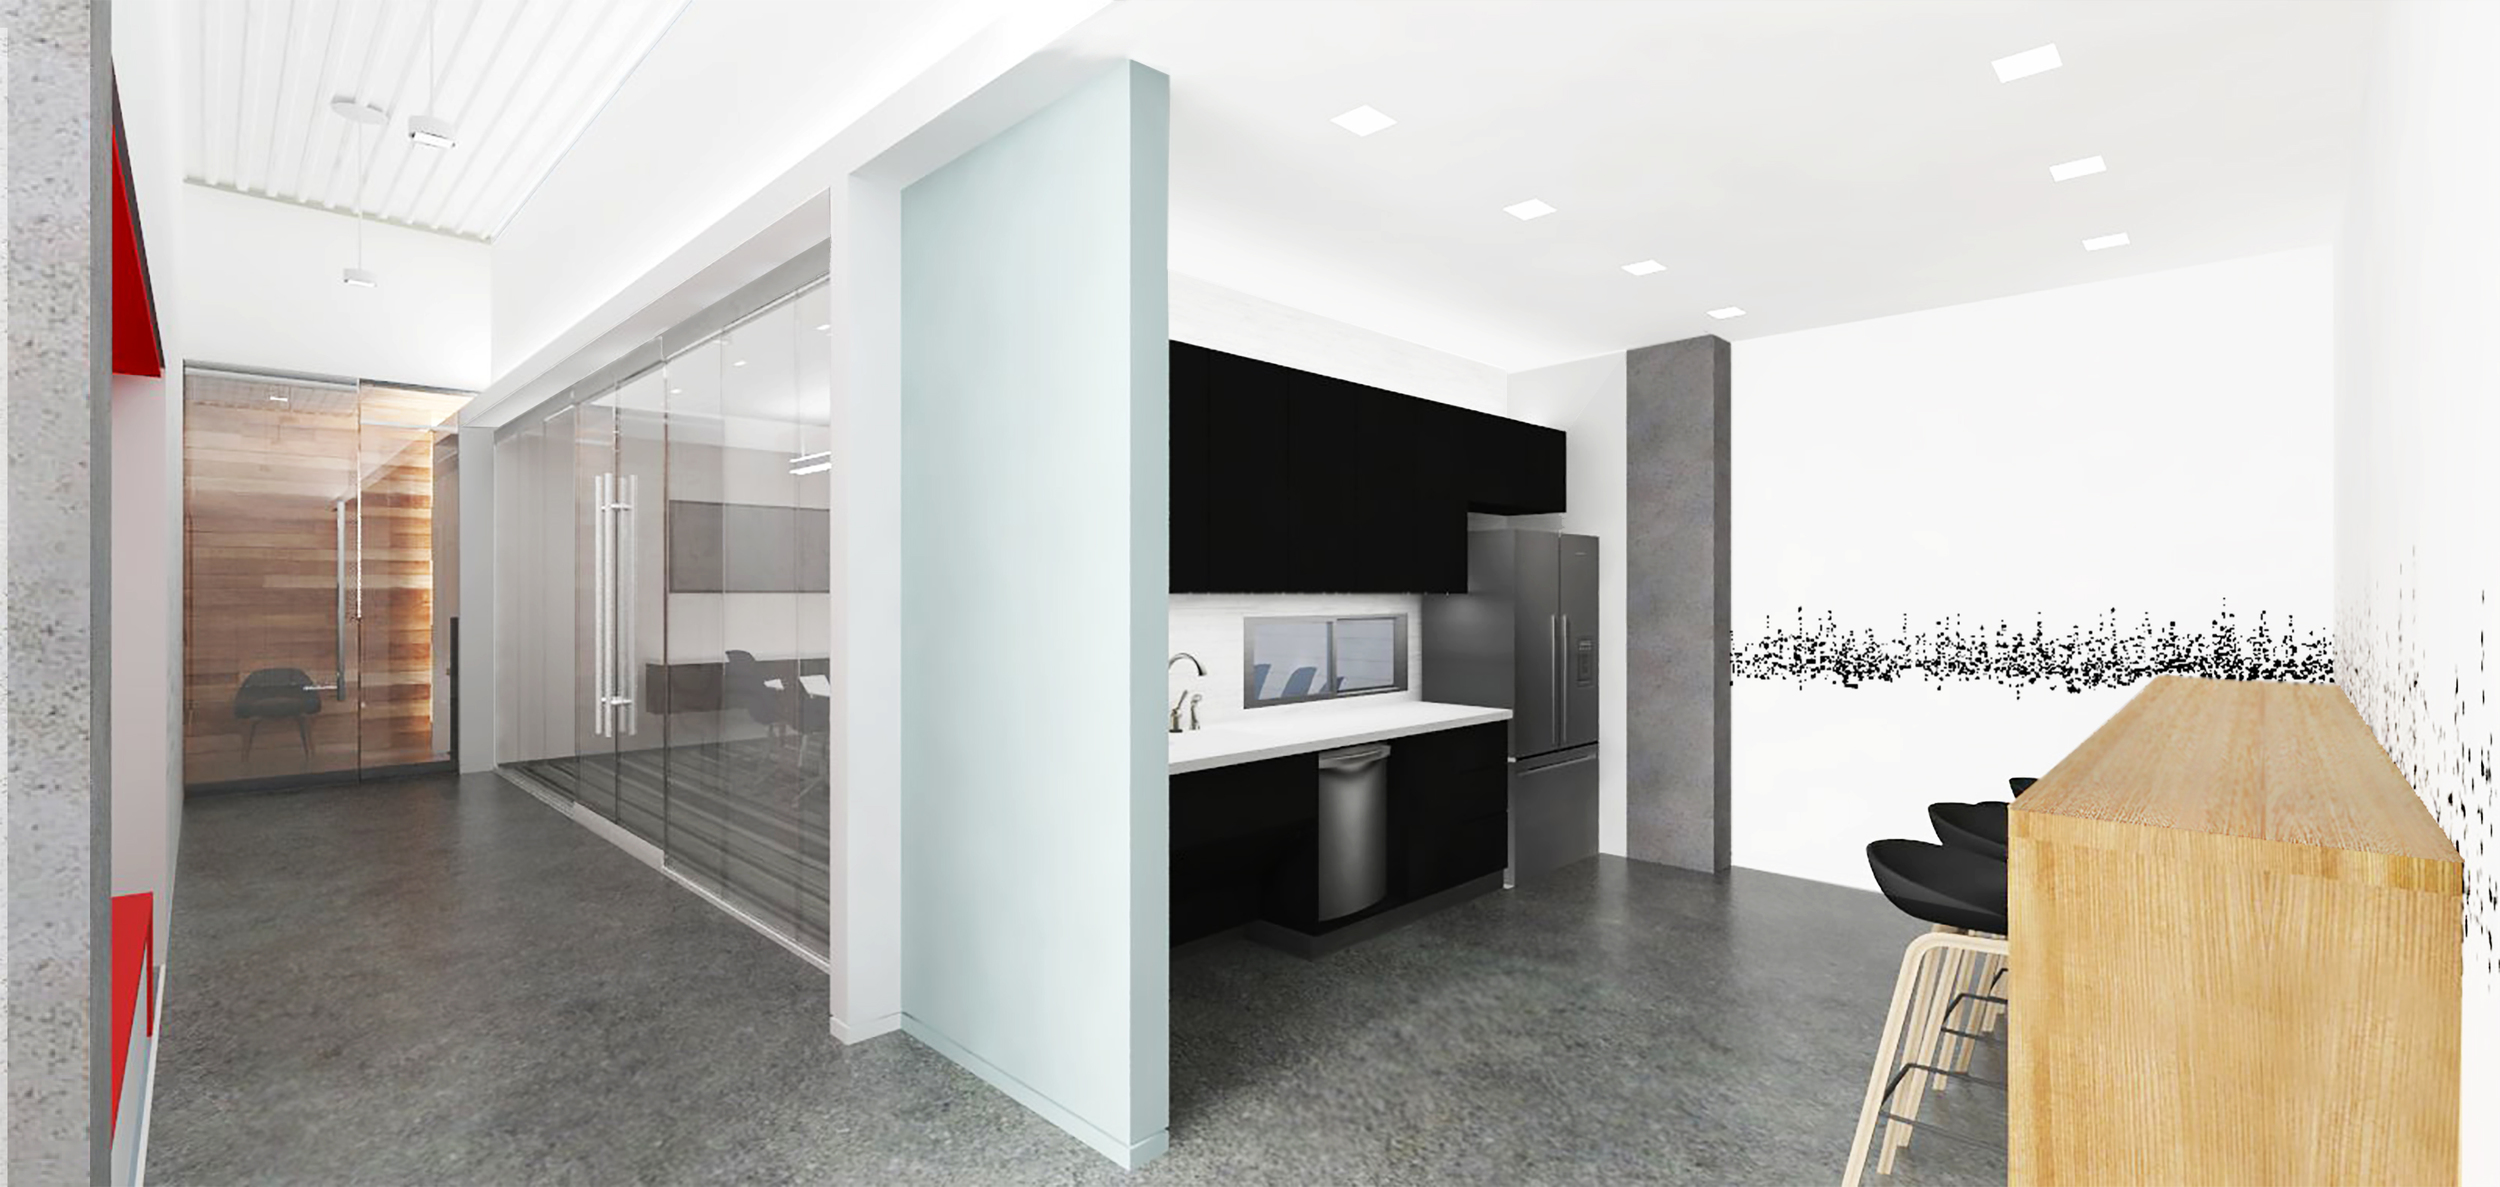 DRAFT - Break Room Corridor.jpg